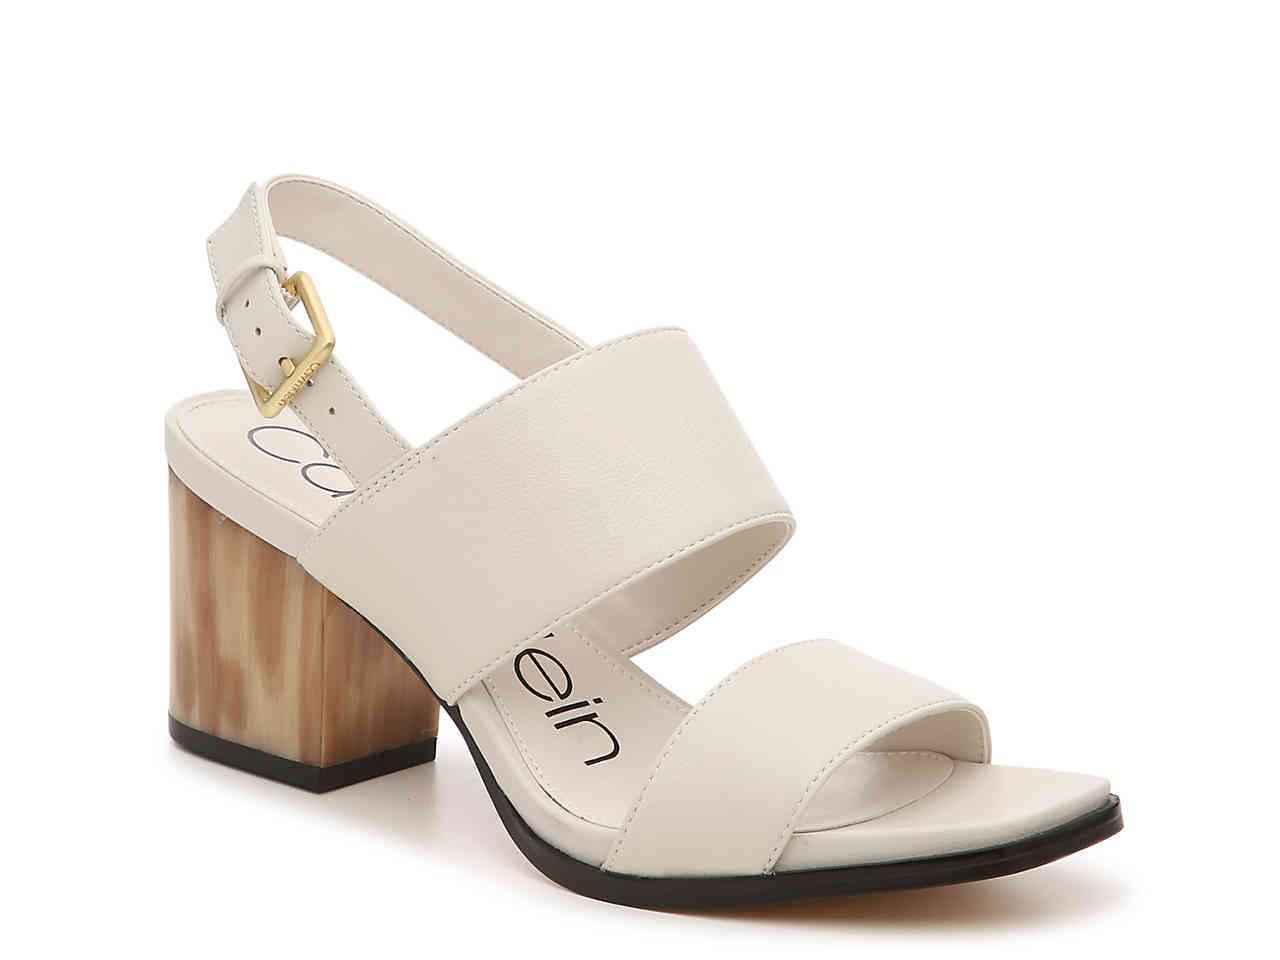 Sandal In Lyst Rosemary White Calvin Klein Crevo ZiTXuwPkO